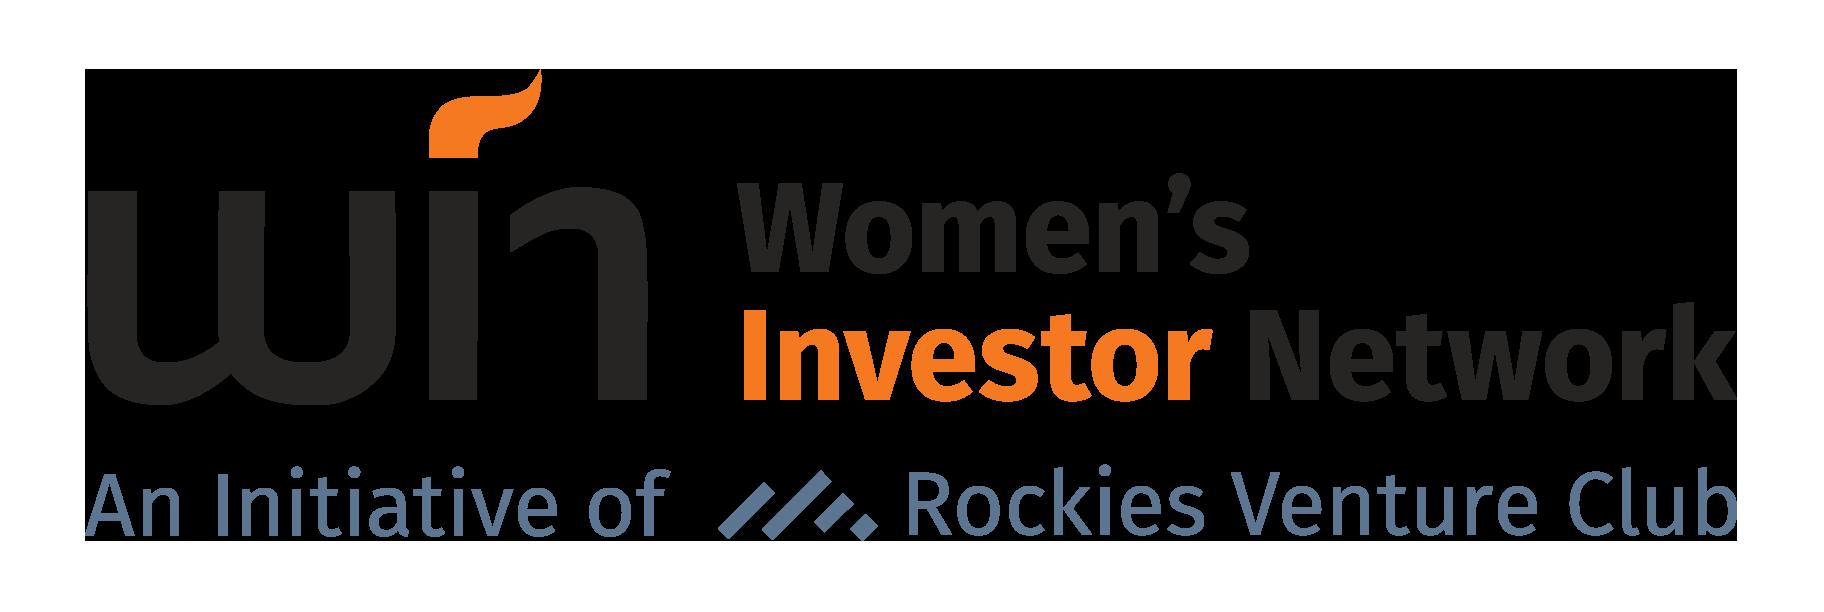 Women's Investor Network